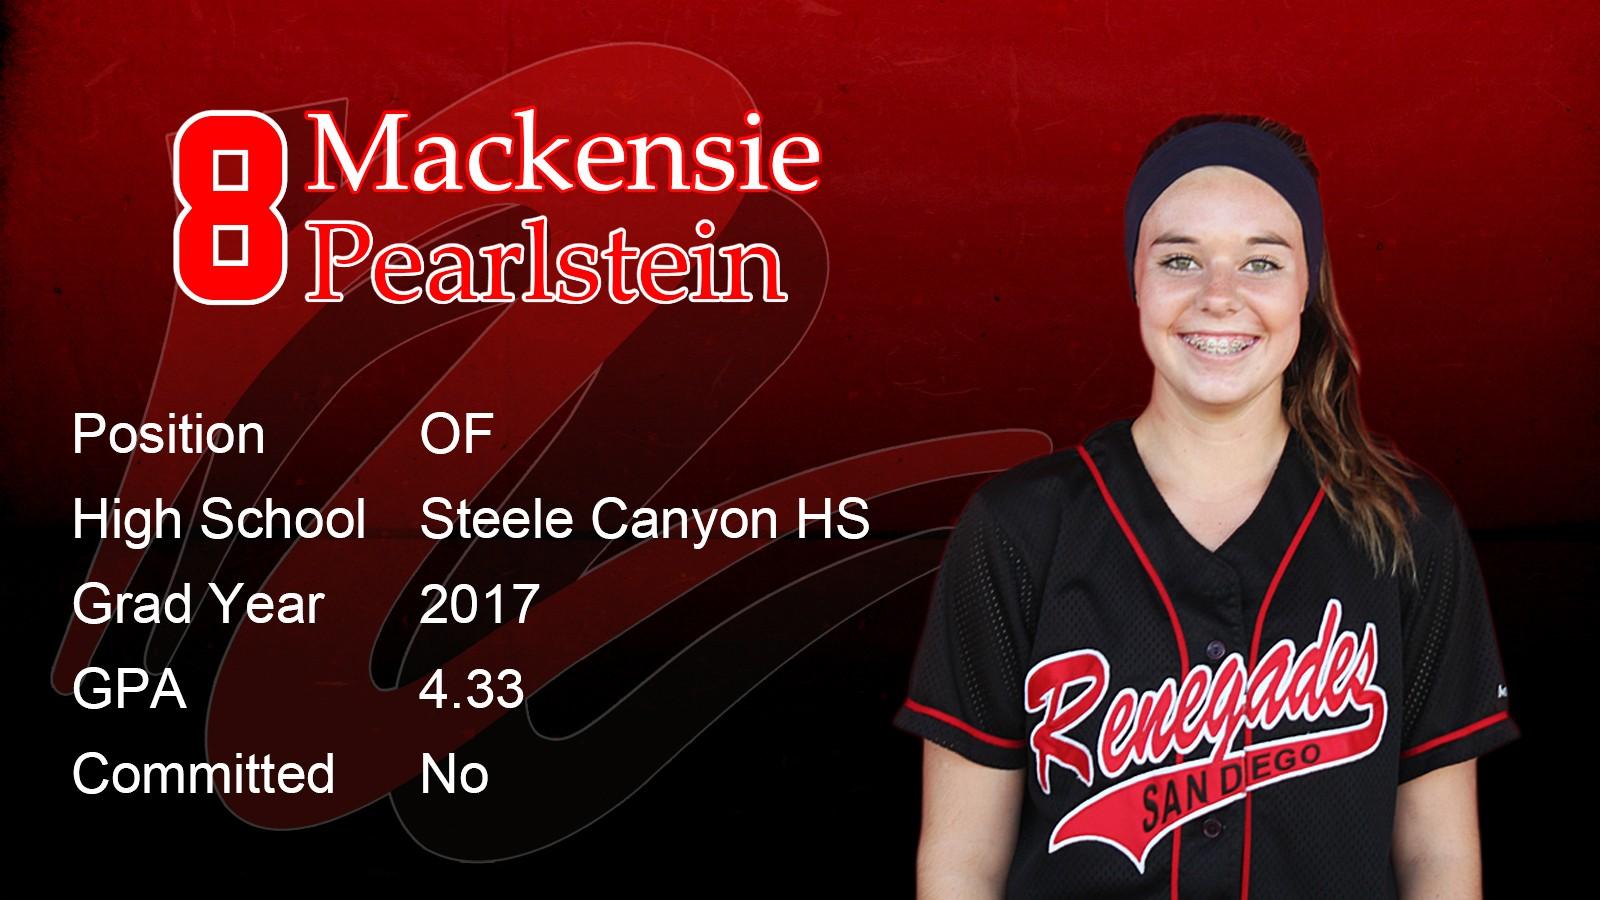 Mackensie-Pearlstein